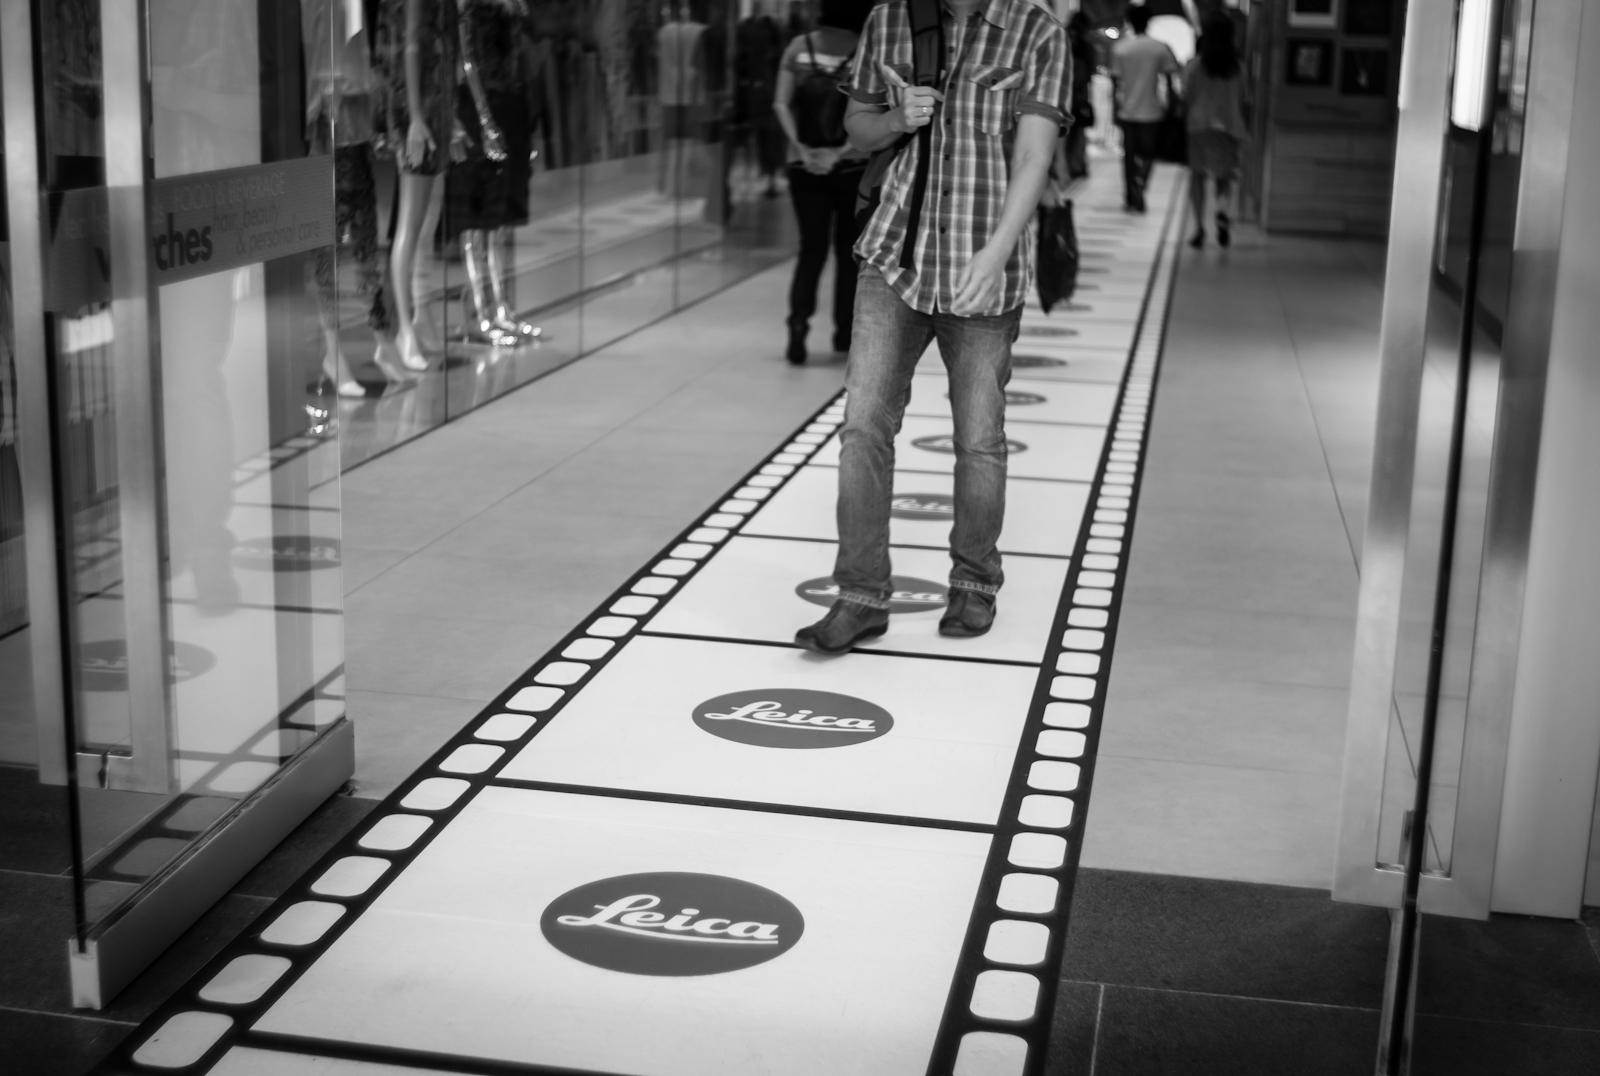 Street photography - Leica print on the ground